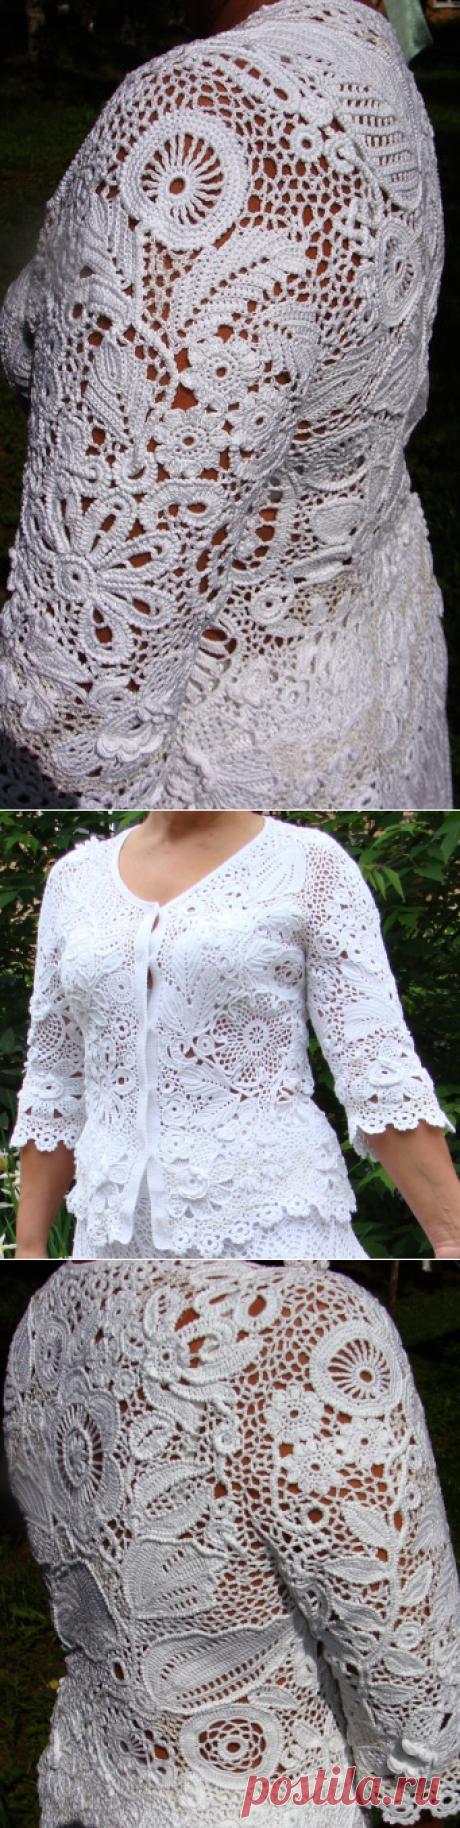 Костюм крючком: юбка+жакет